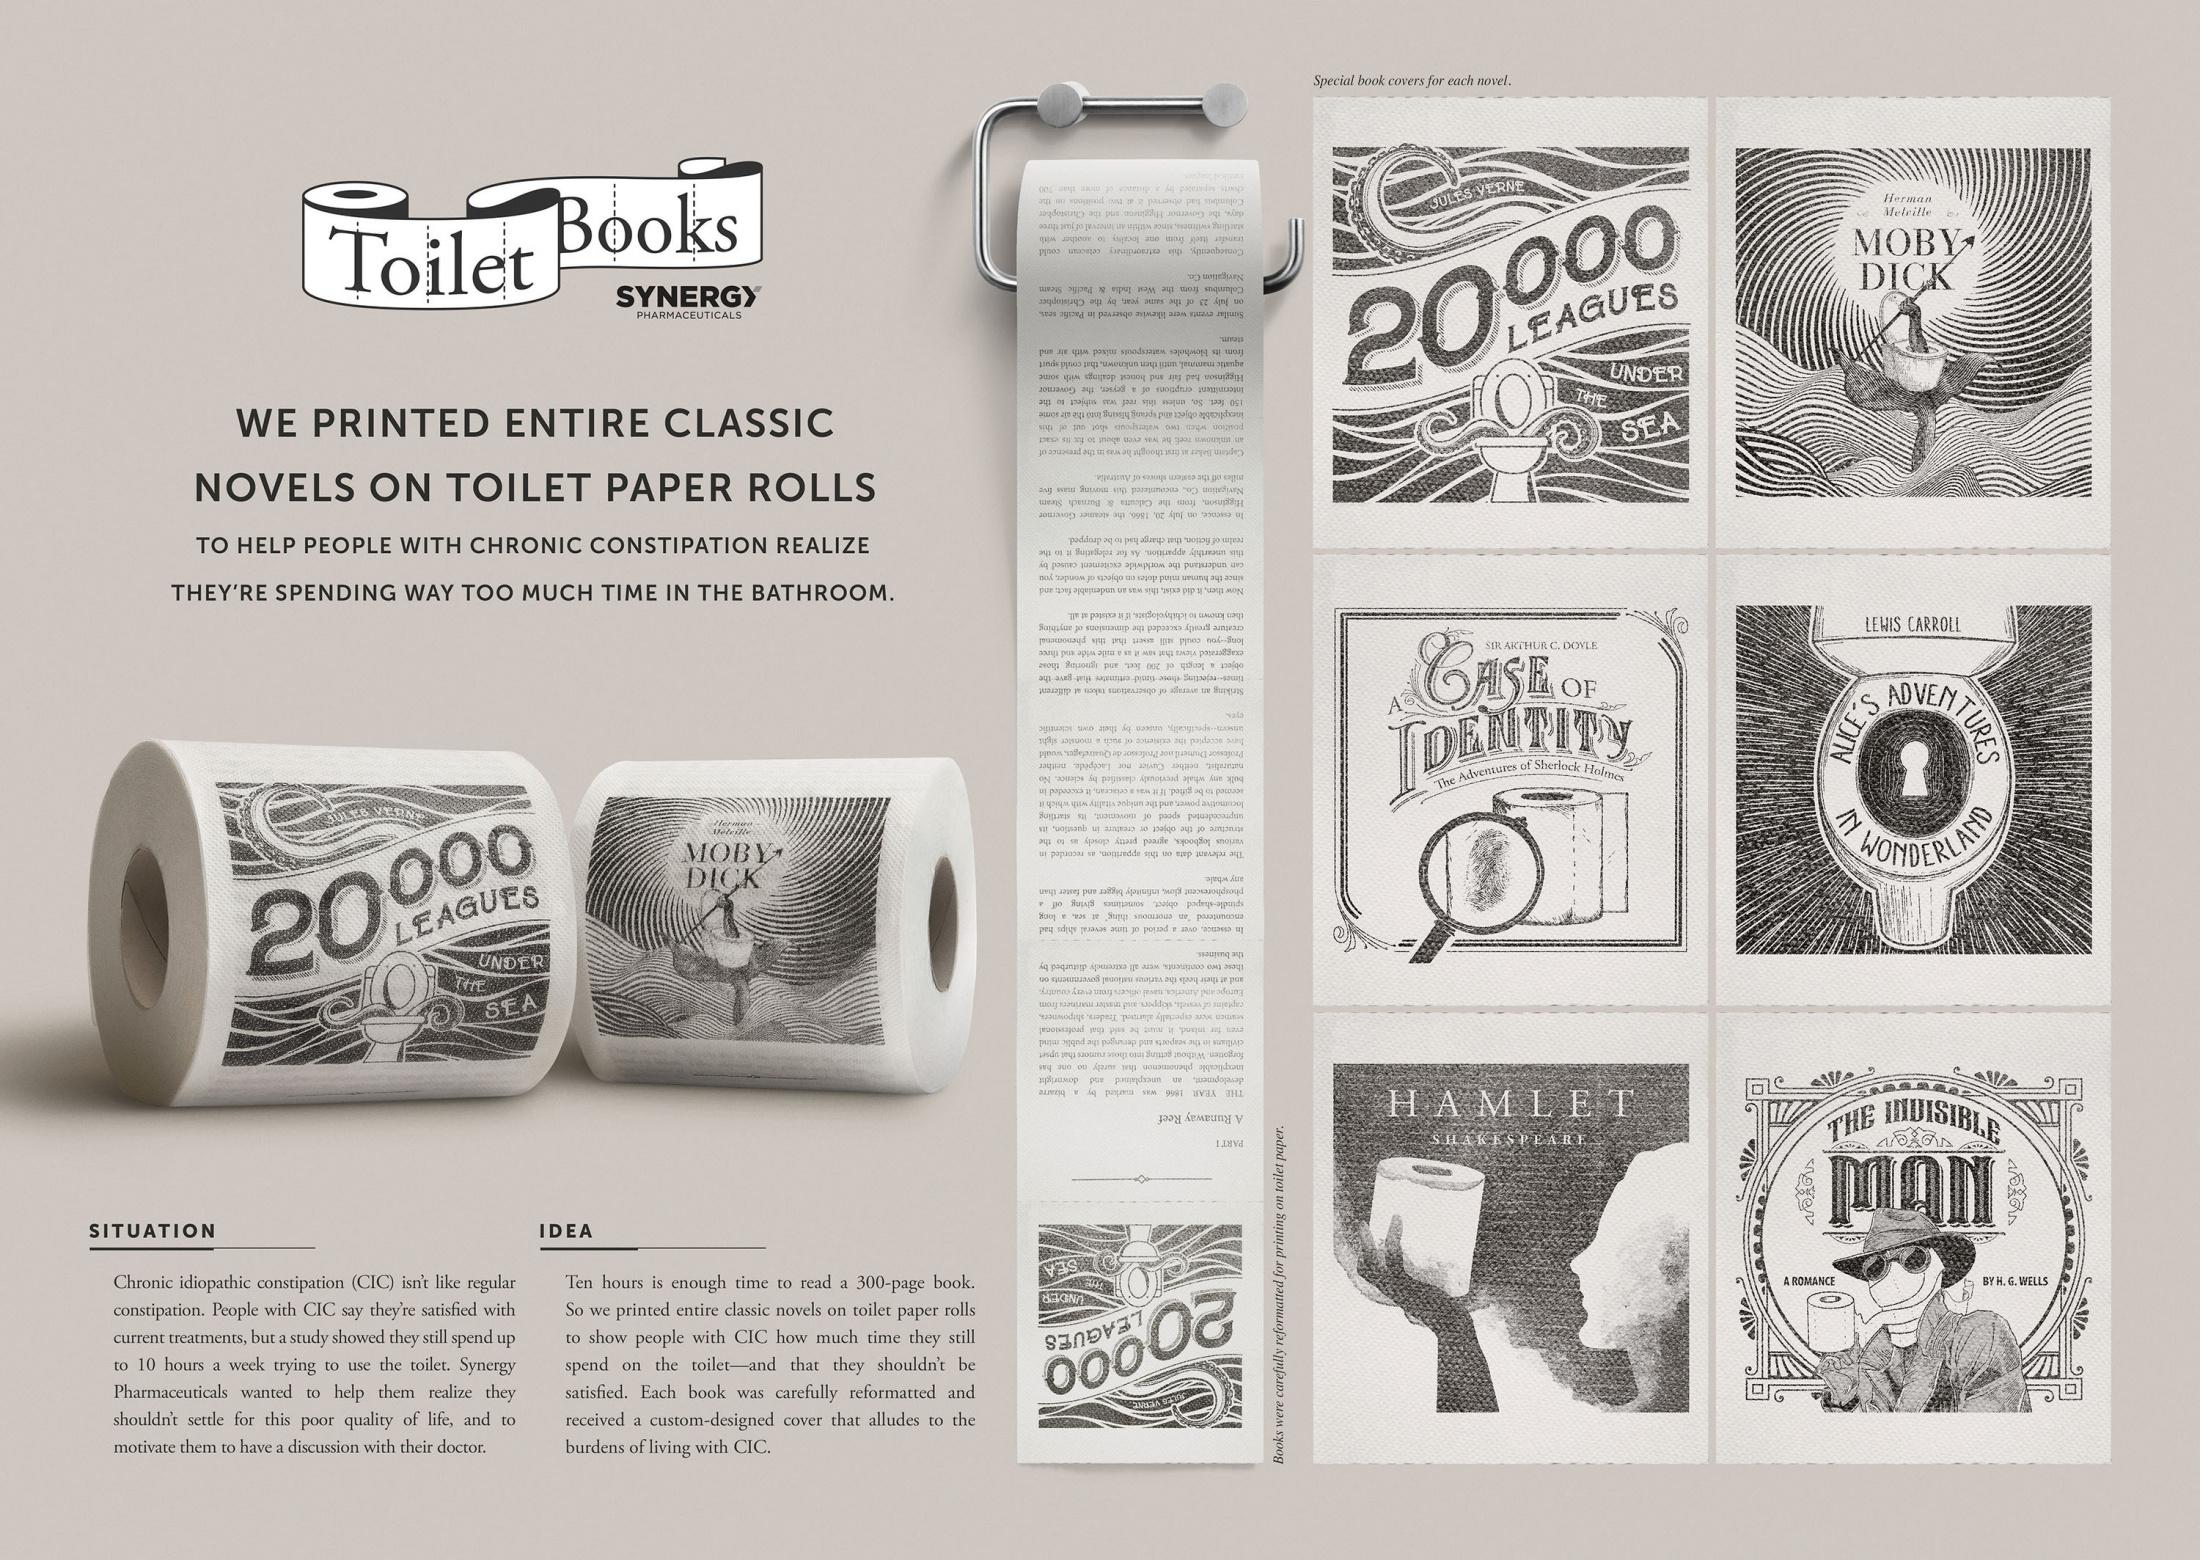 Thumbnail for Toilet Books